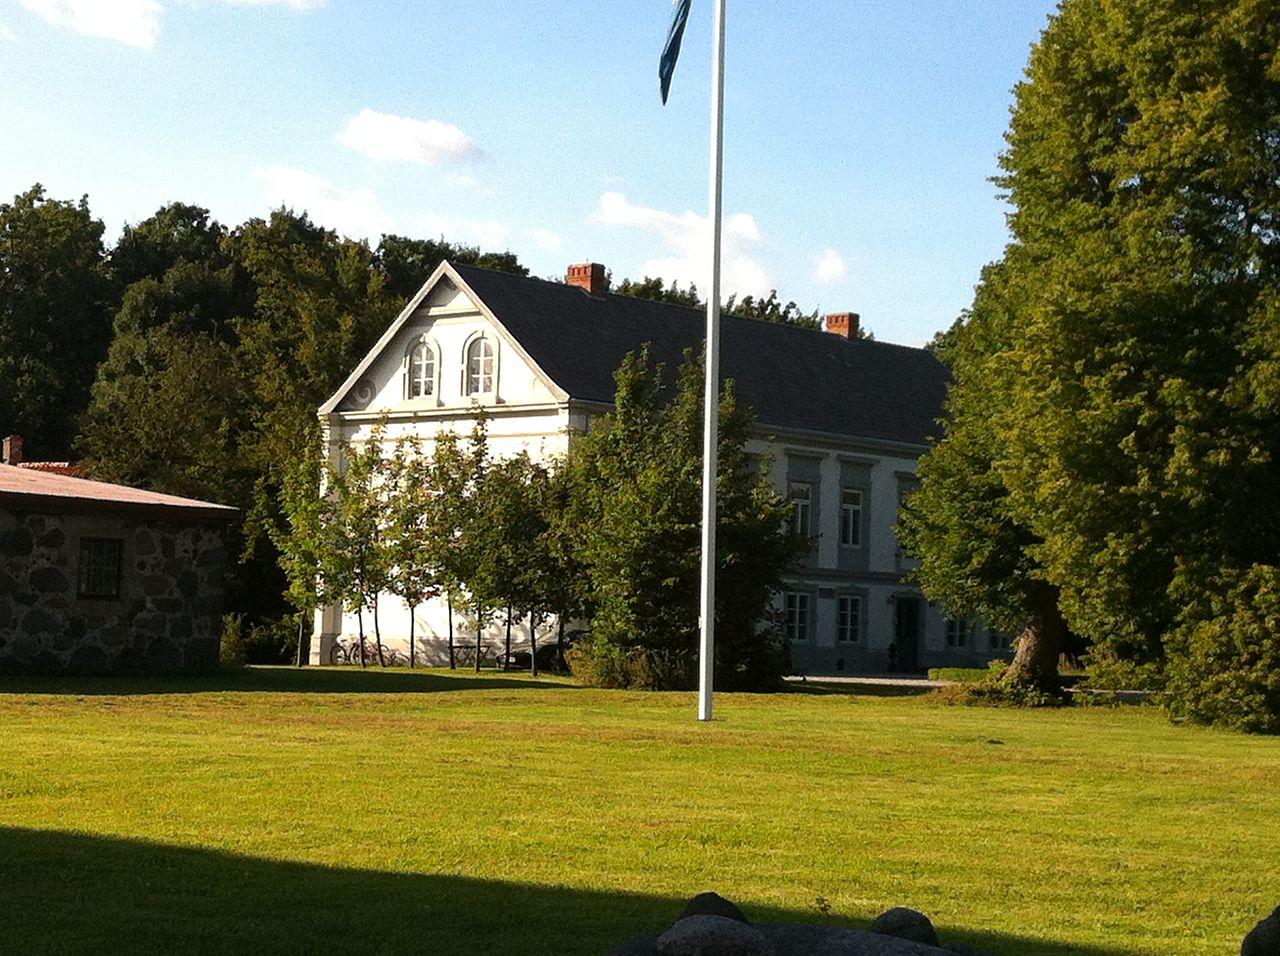 östersund dating site kolsva dating